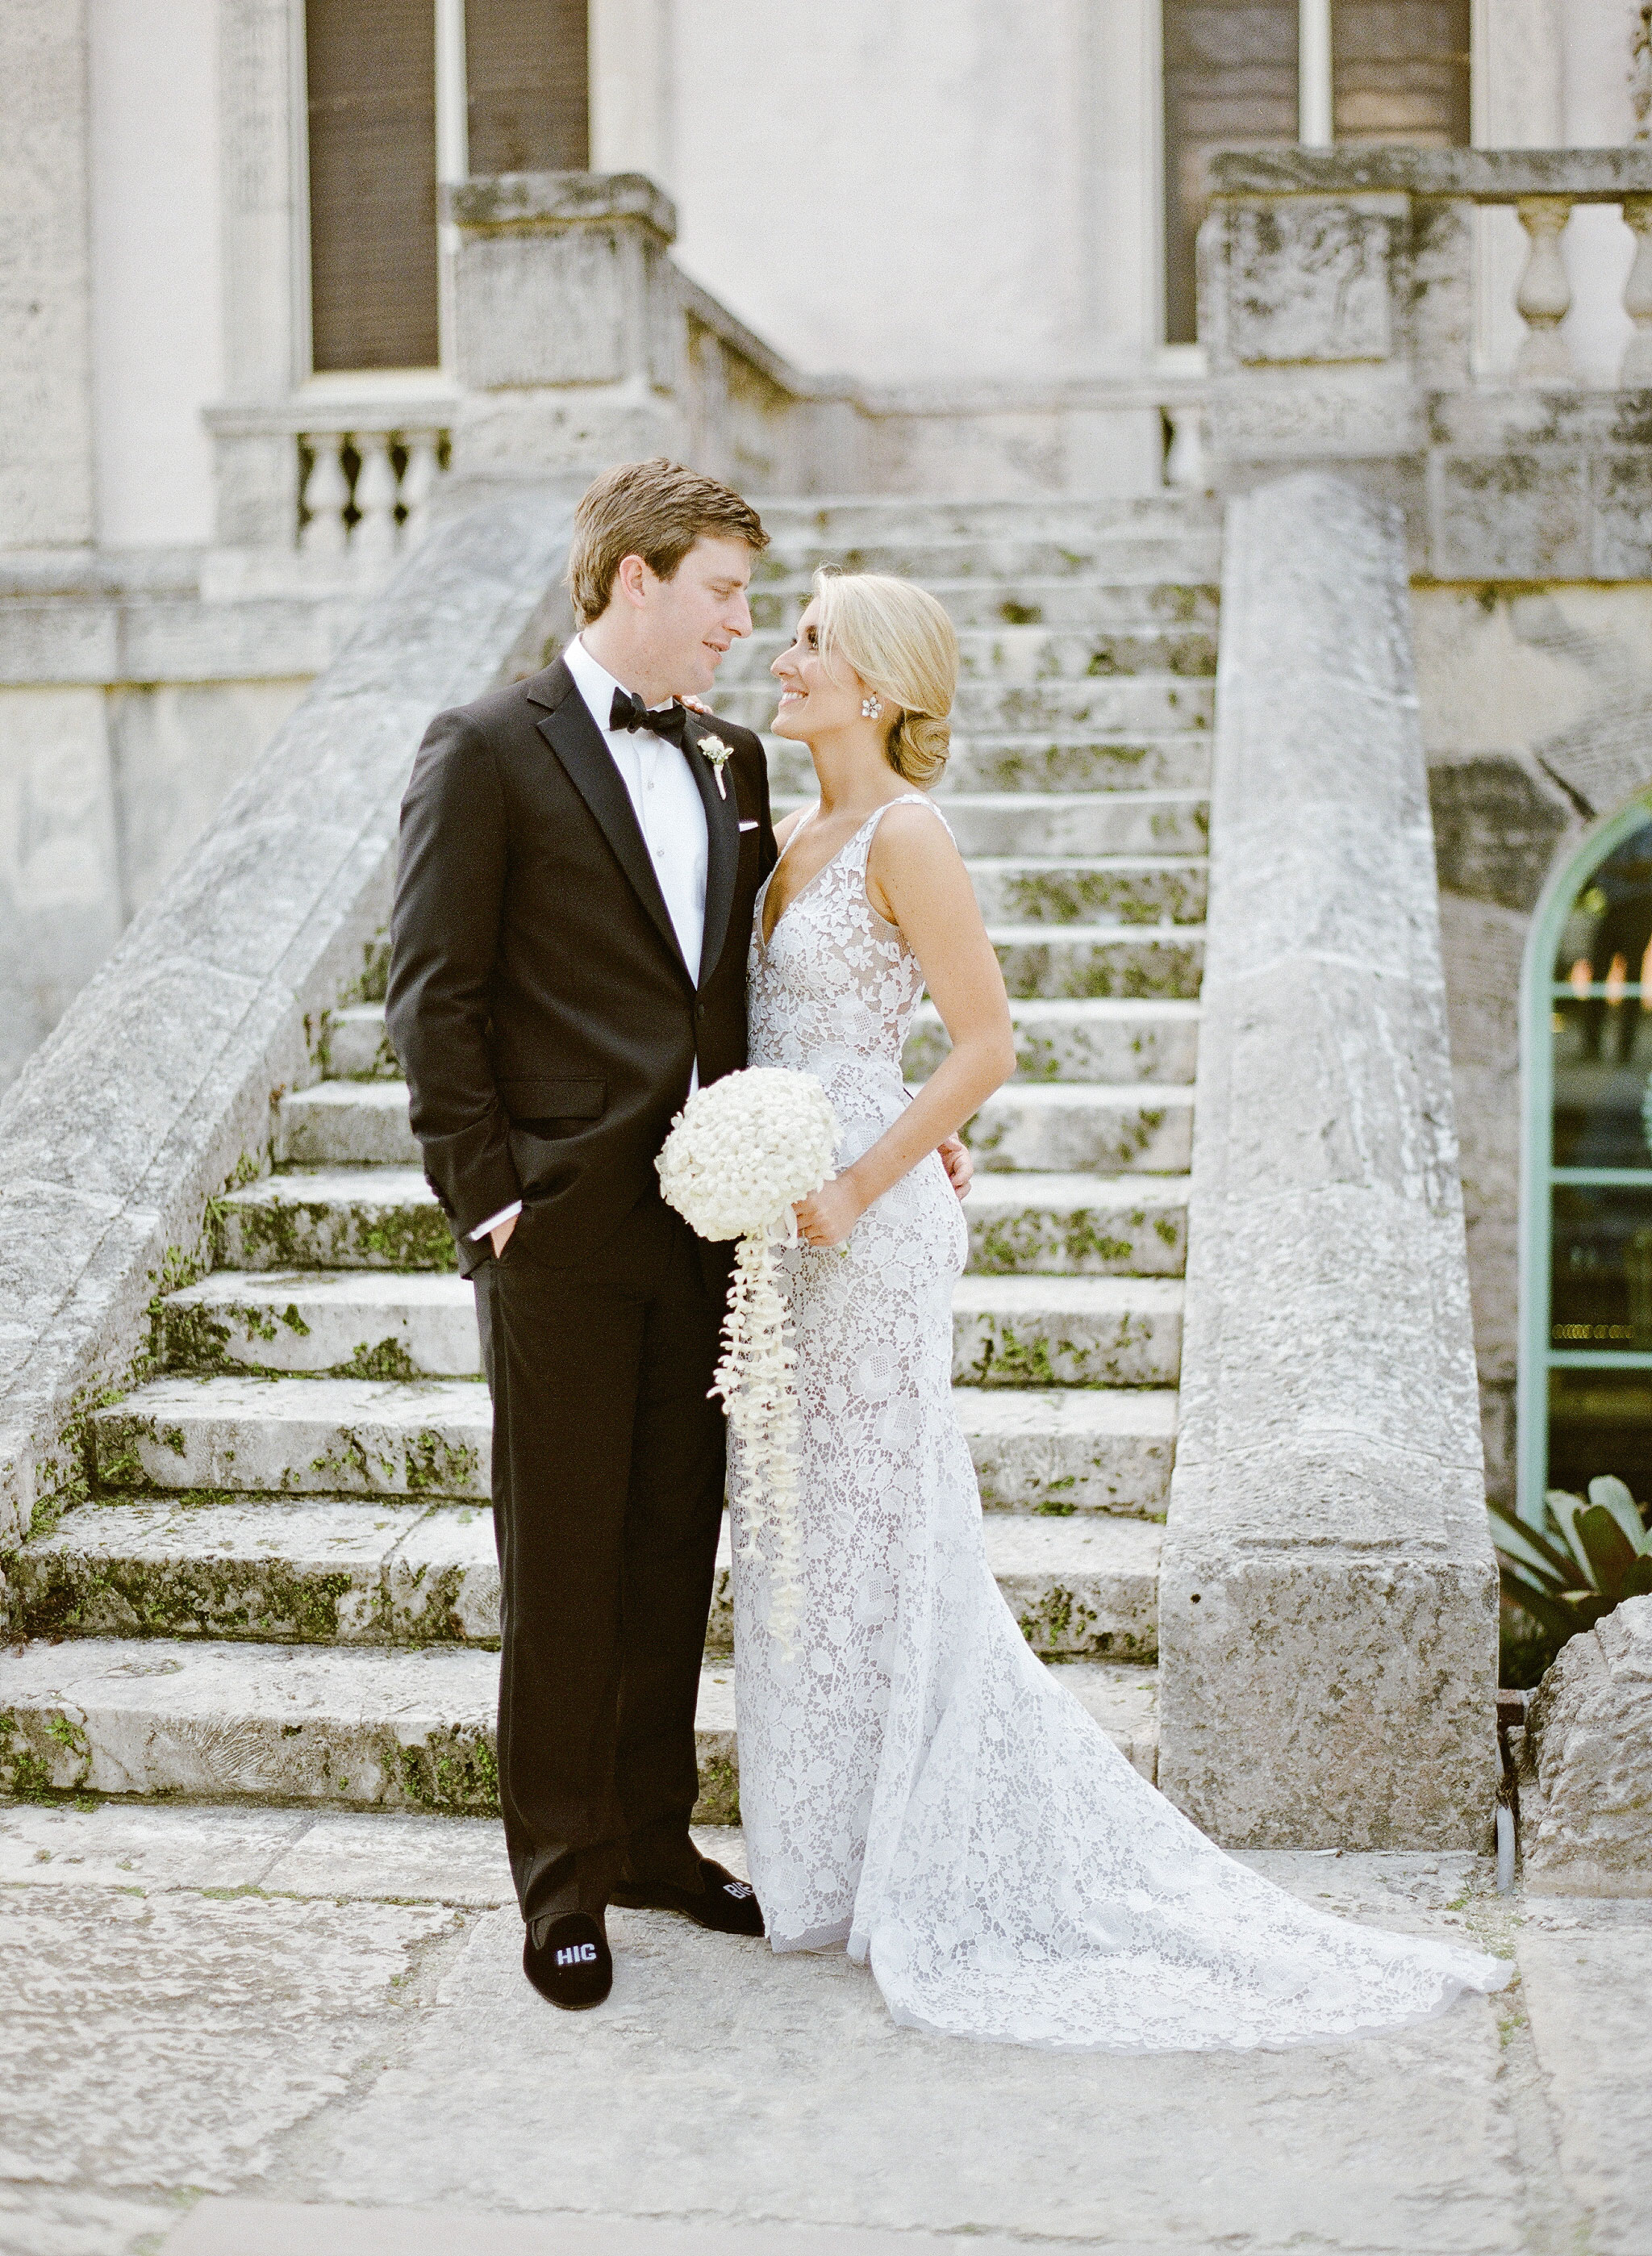 natalie jamey wedding couple gaze